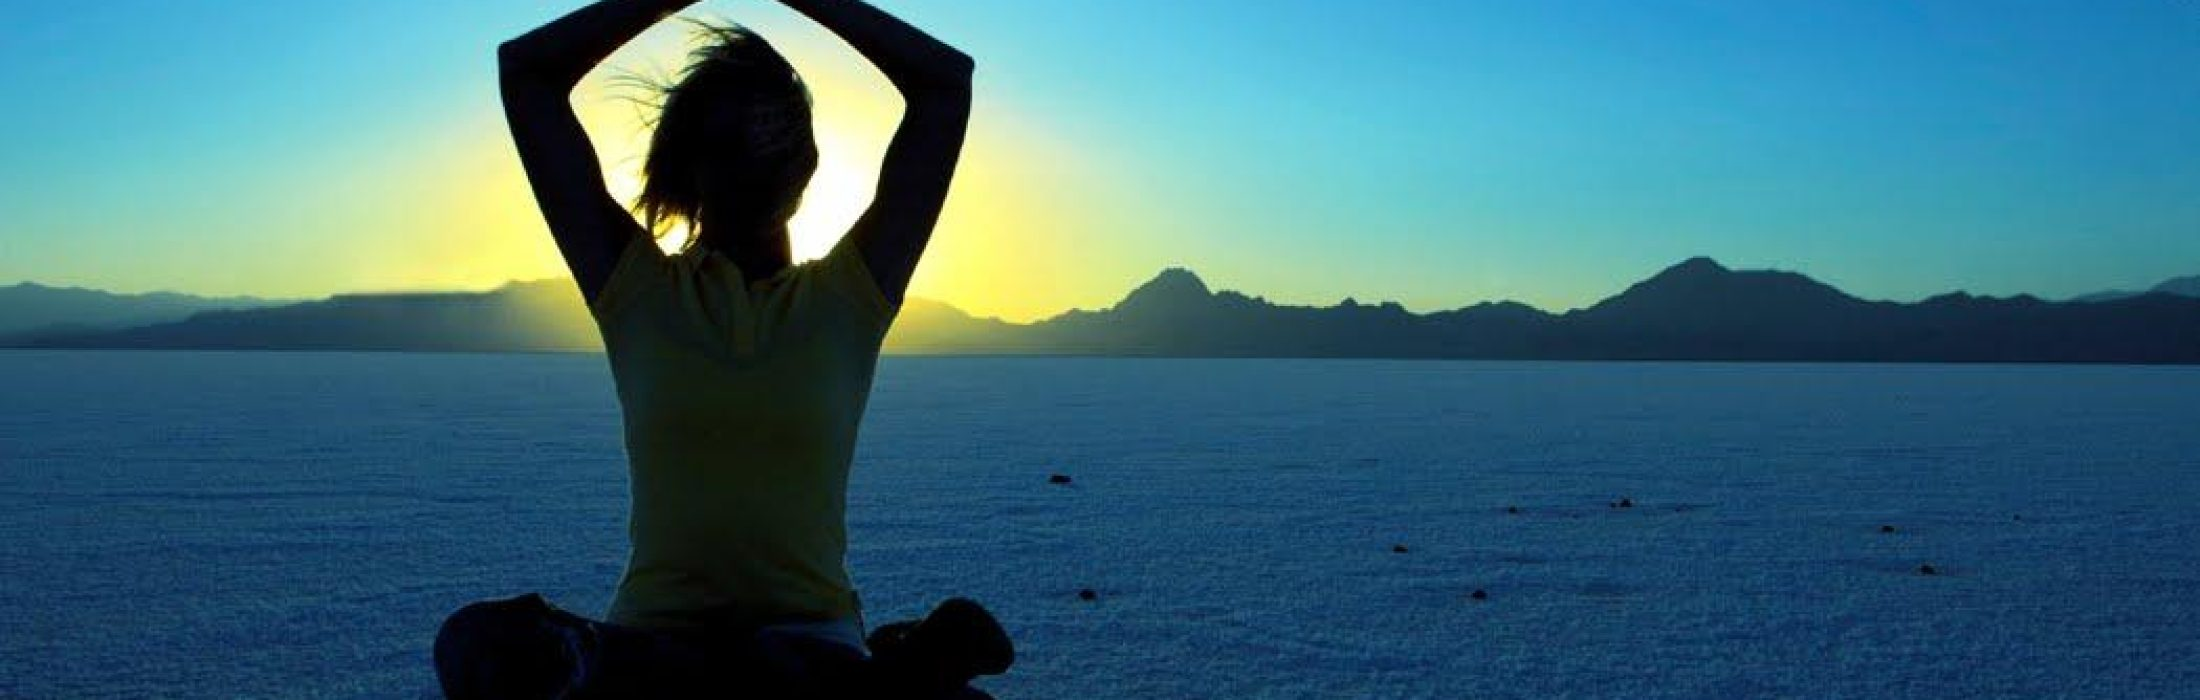 Meditación anjali